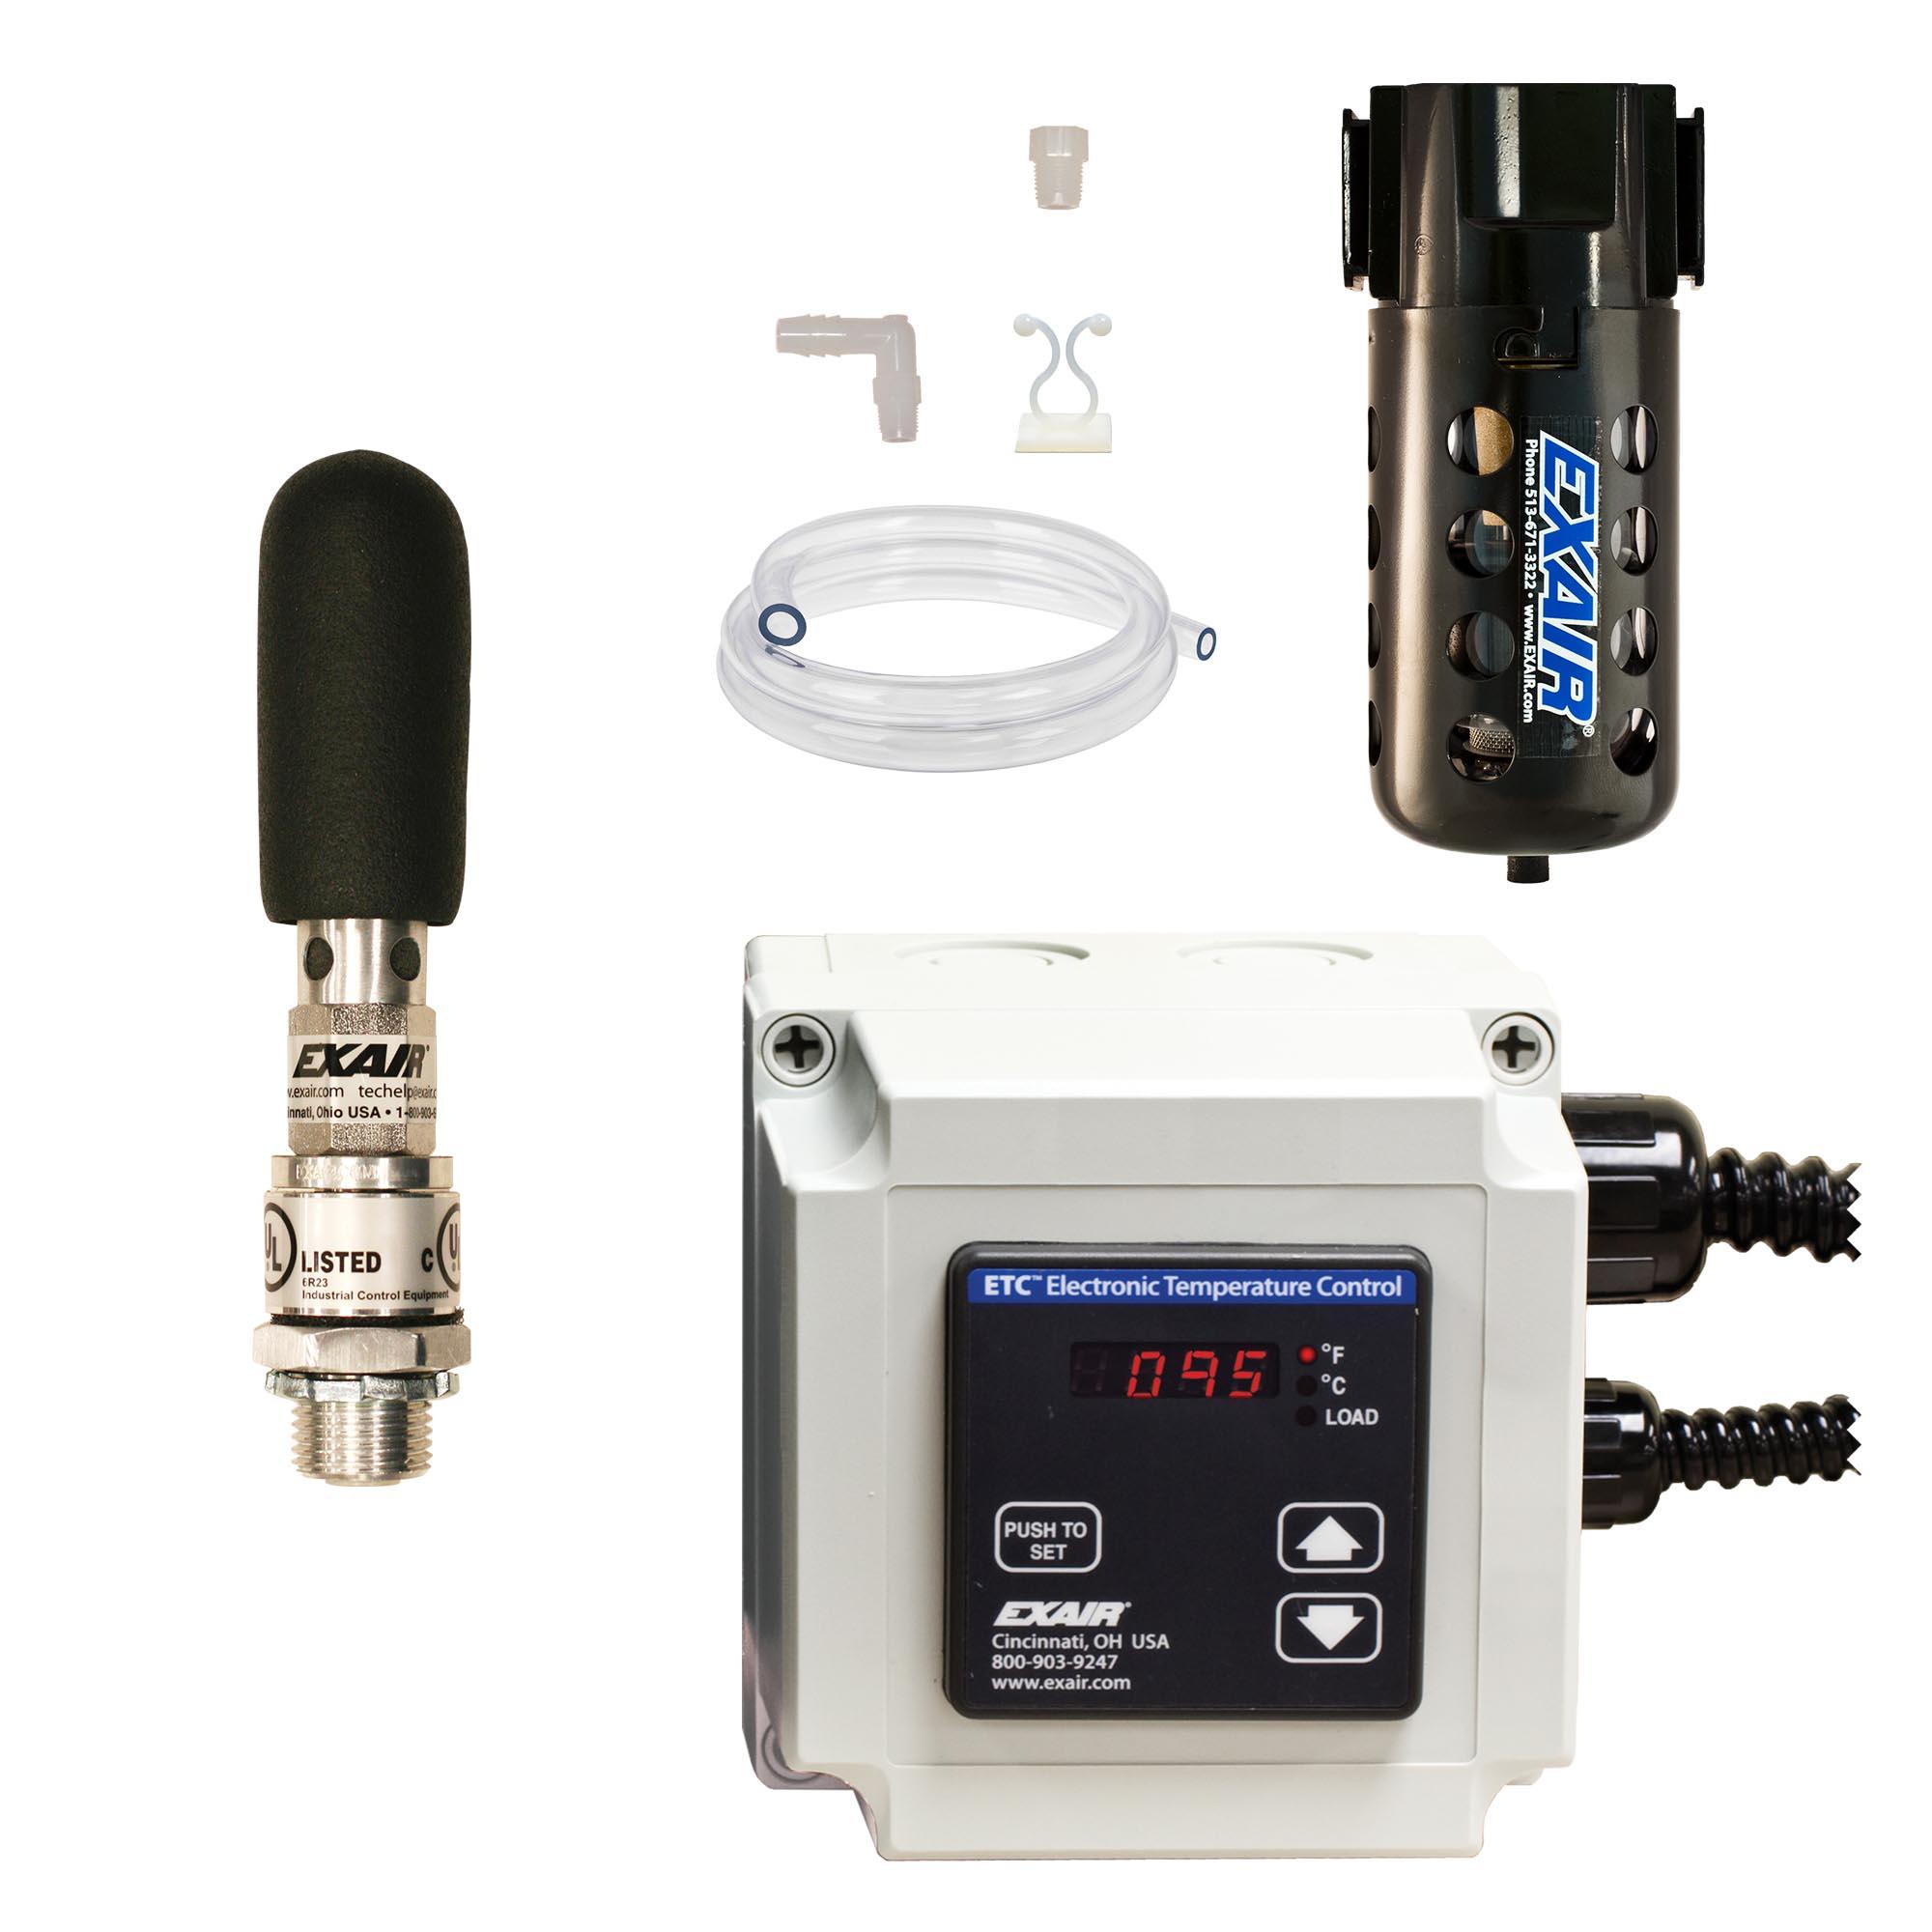 Model W4304-ETC120 NEMA 12 275 Btu/hr Cabinet Cooler System with ETC Thermostat Control, 120V